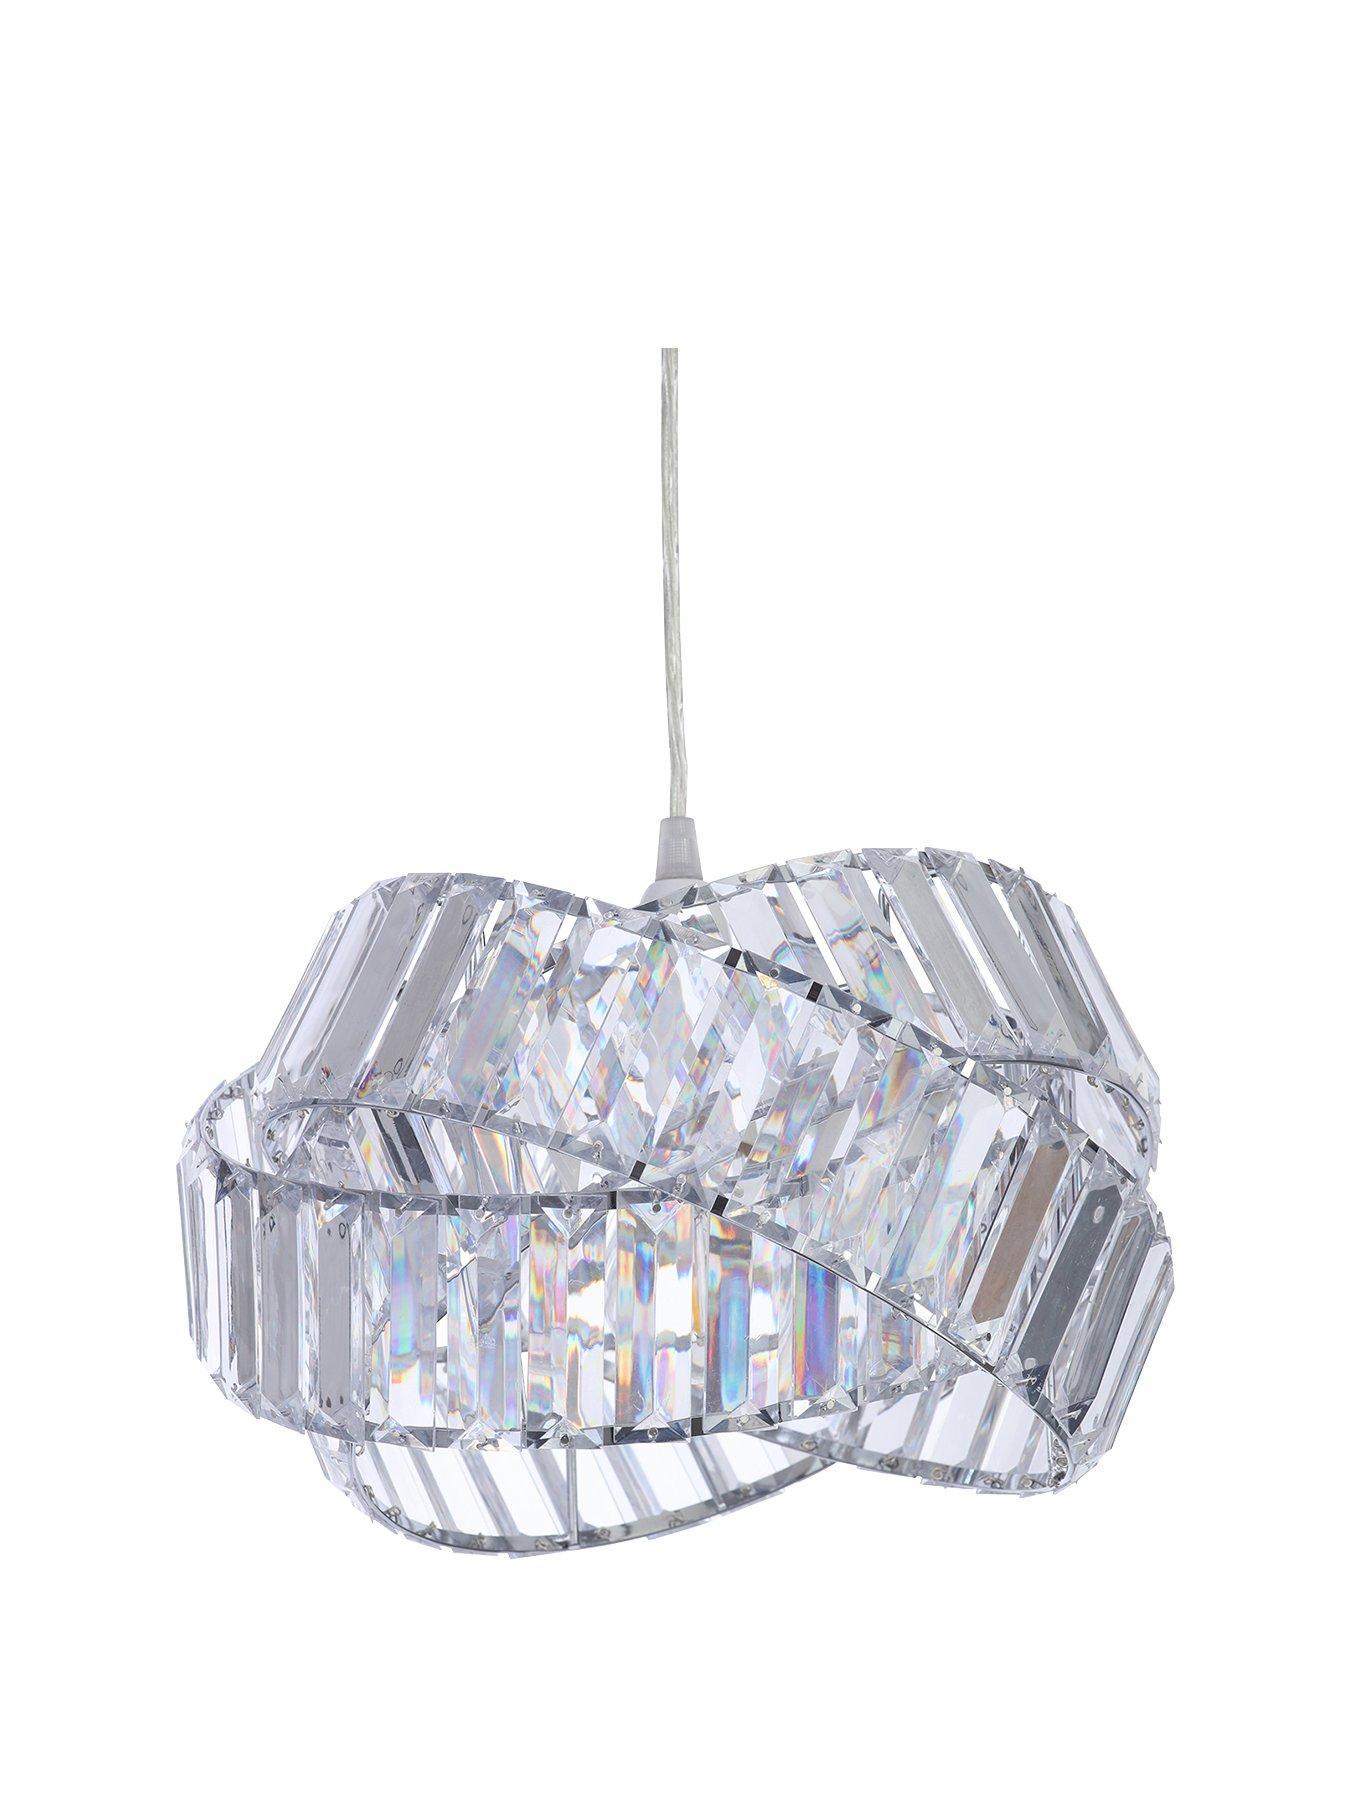 ceiling lights spotlights home